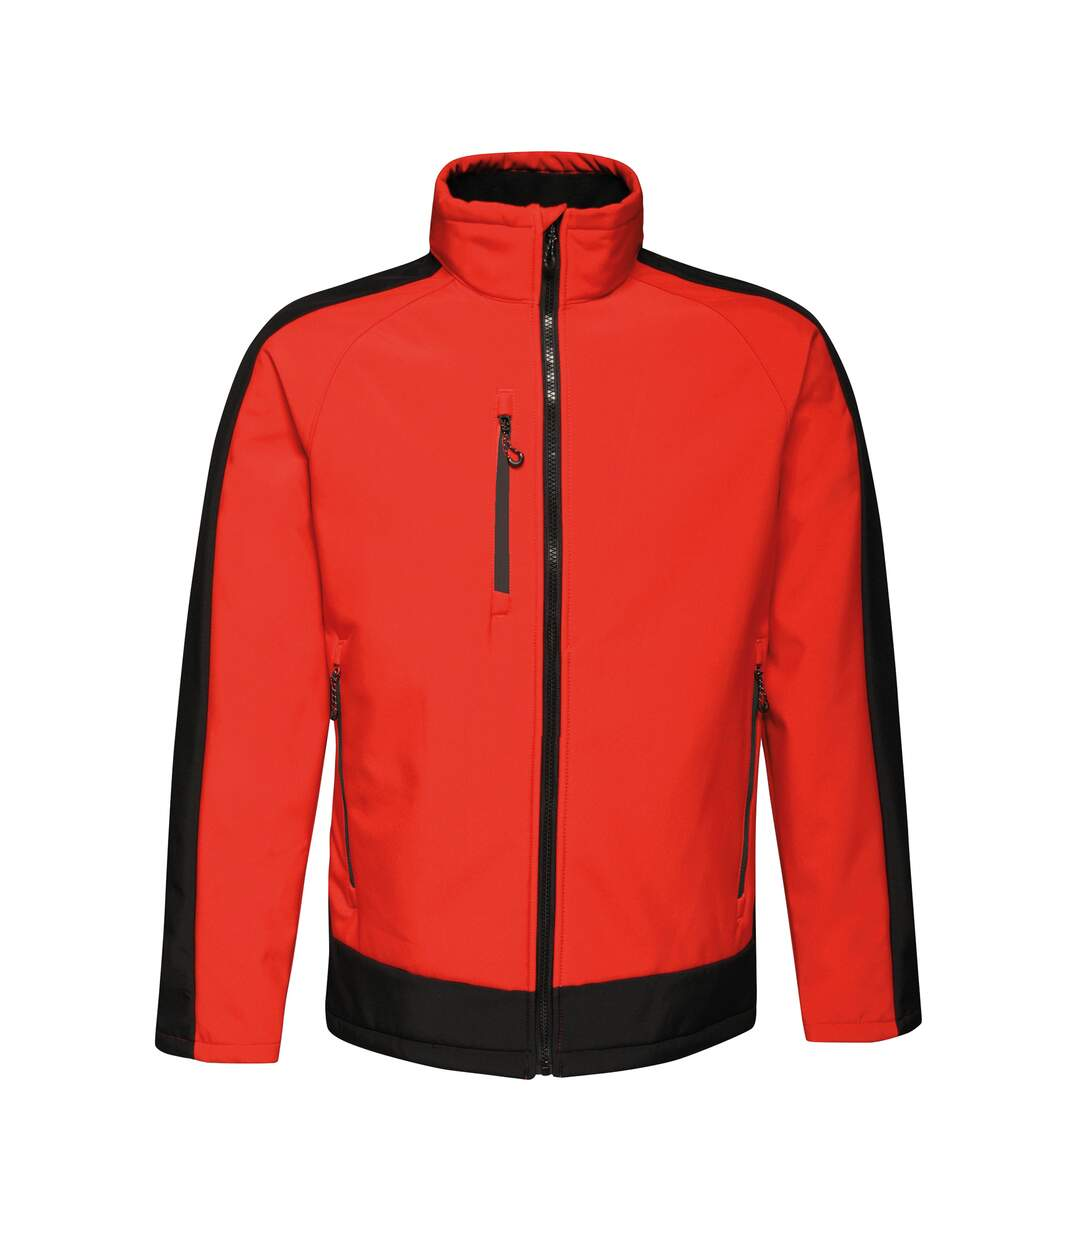 Regatta Contrast Mens 3-Layer Printable Softshell Jacket (Classic Red/Black) - UTRW6355